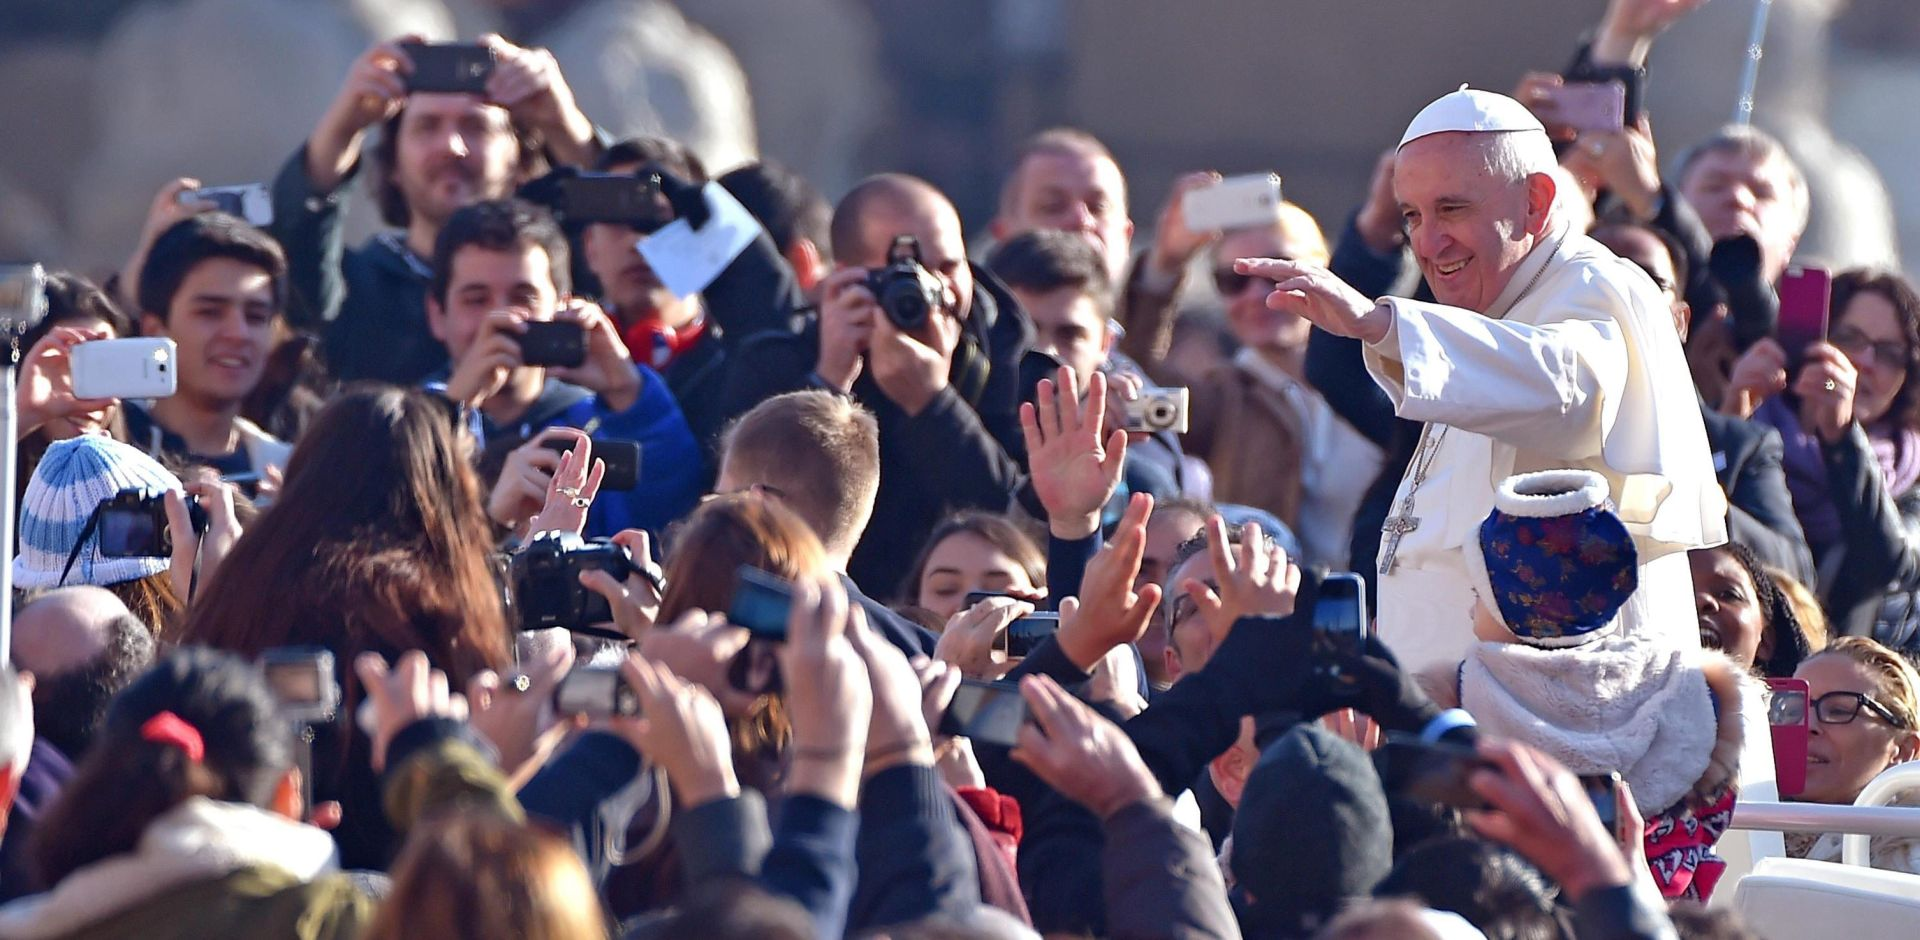 NEOČEKIVANA IZJAVA: Papa priznaje da je grešnik